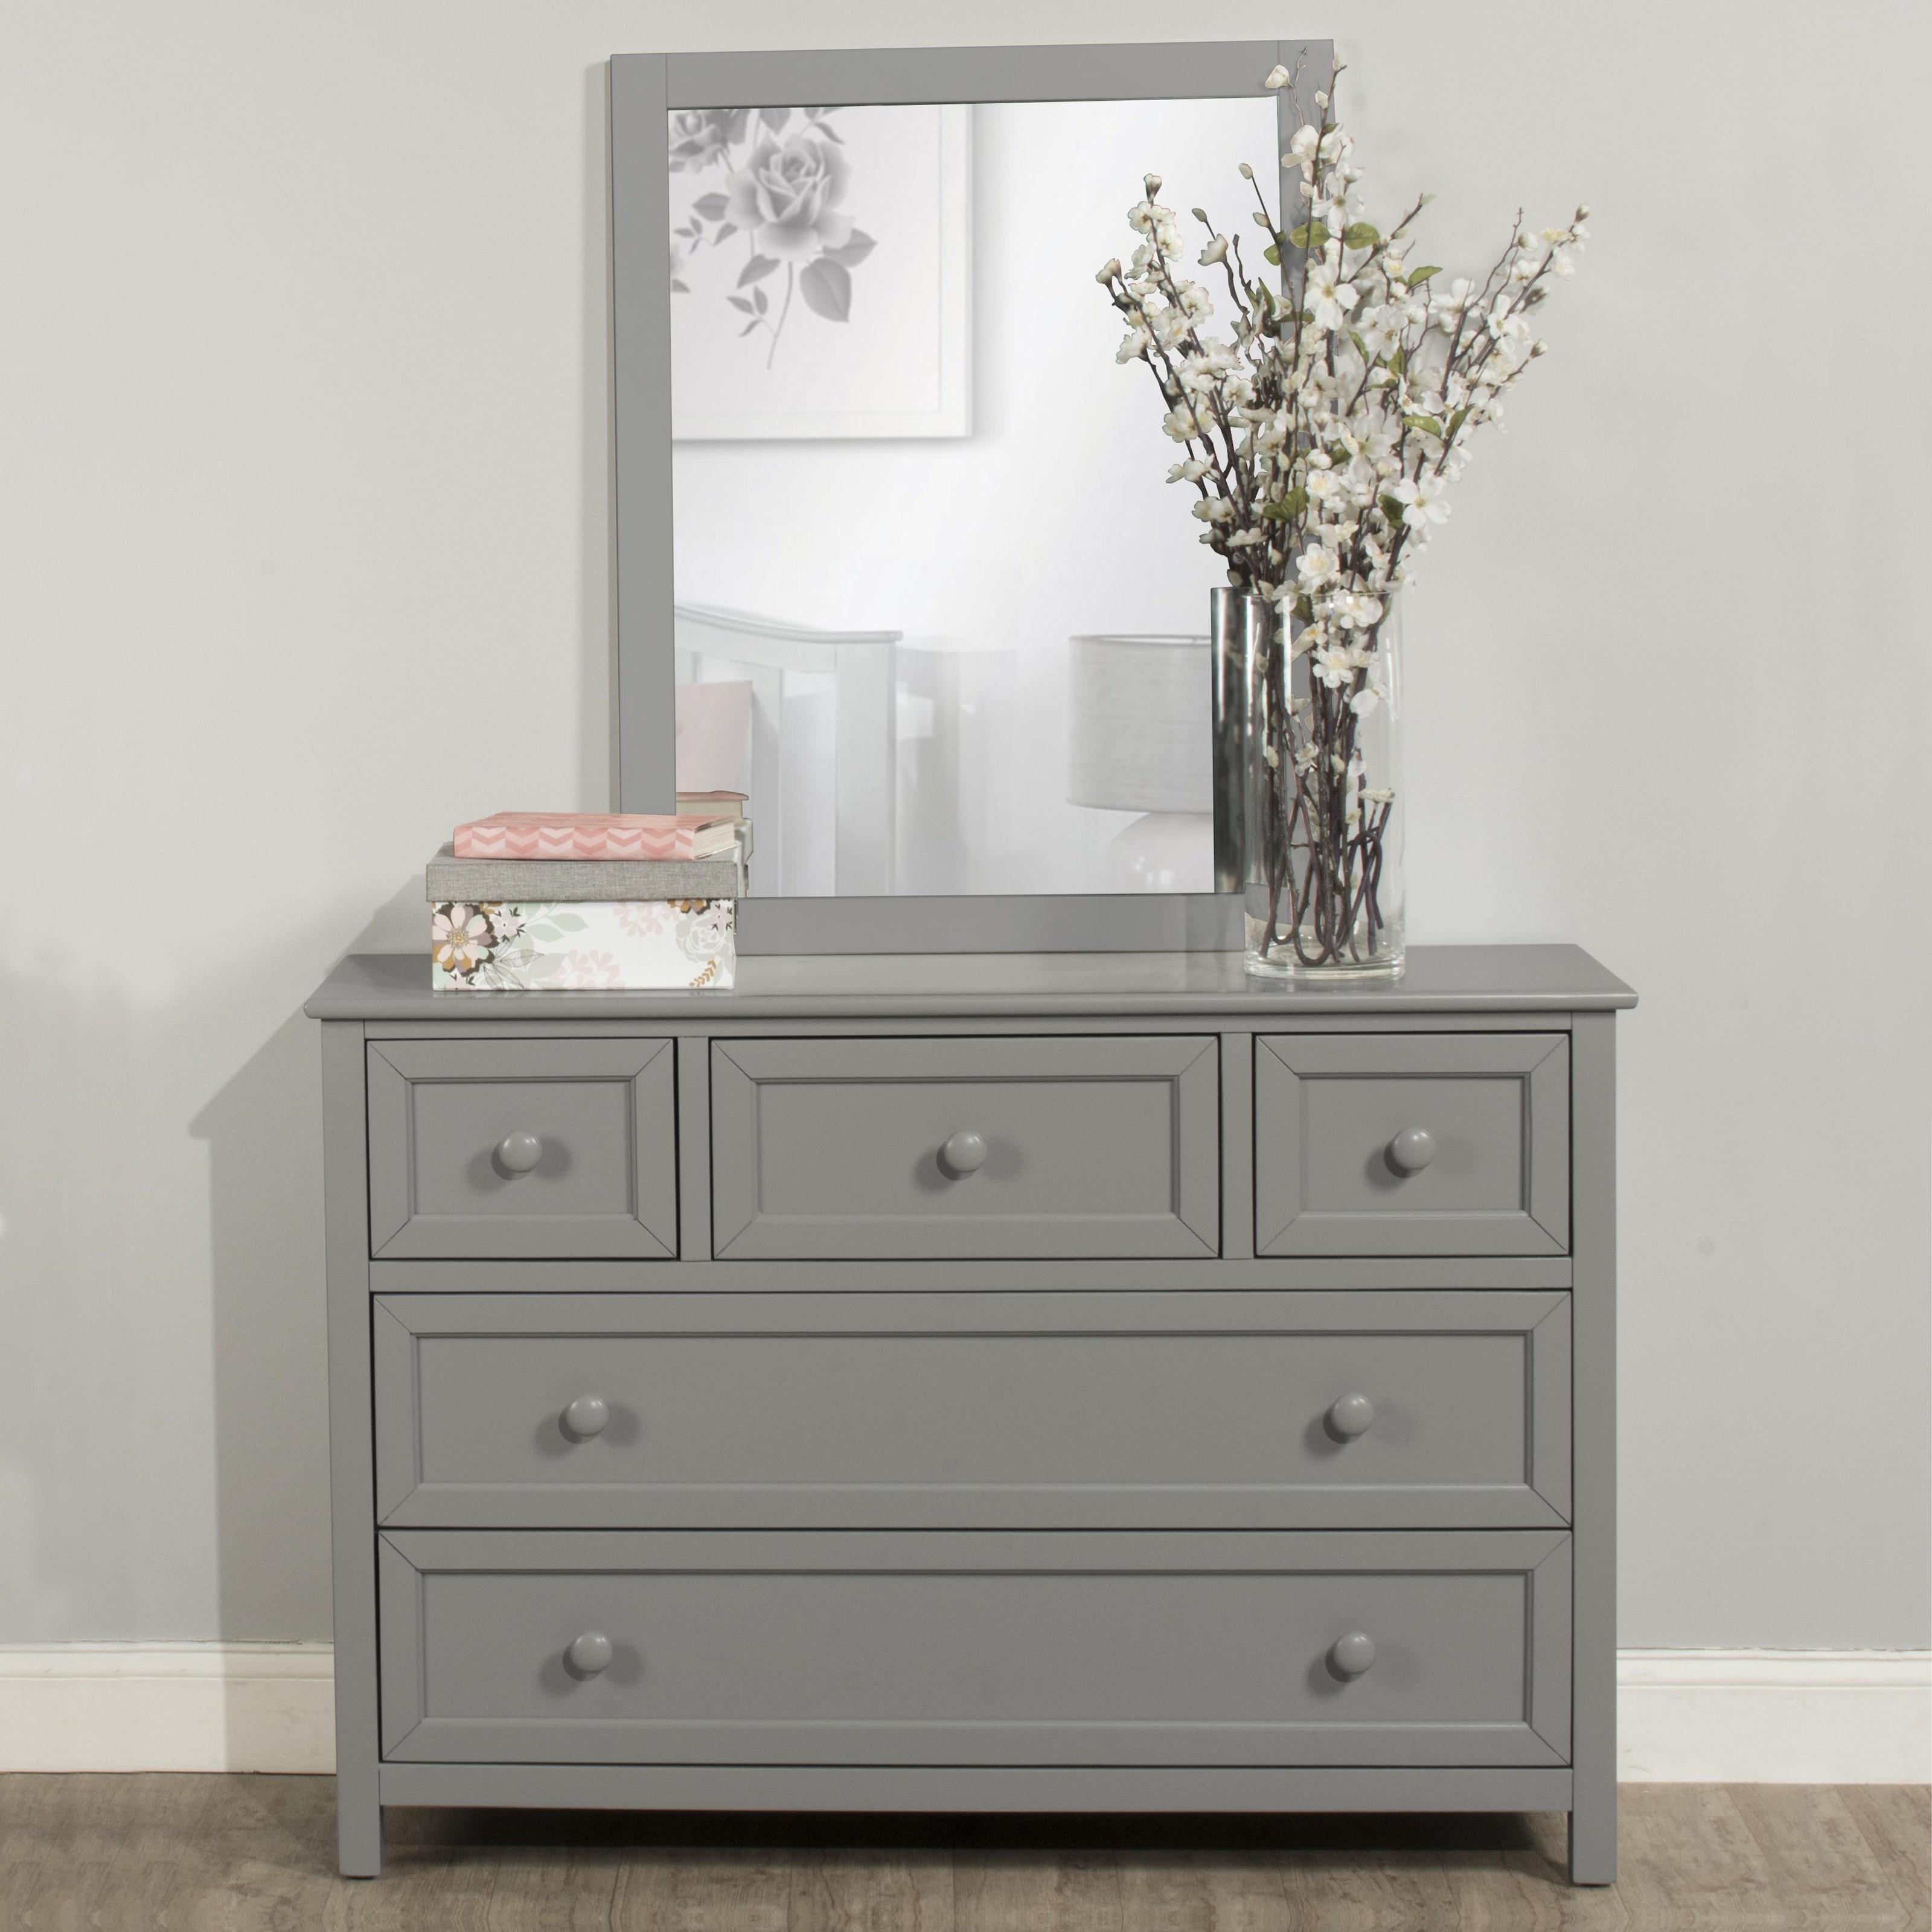 Schoolhouse 4.0 Dresser Mirror at Ruby Gordon Home